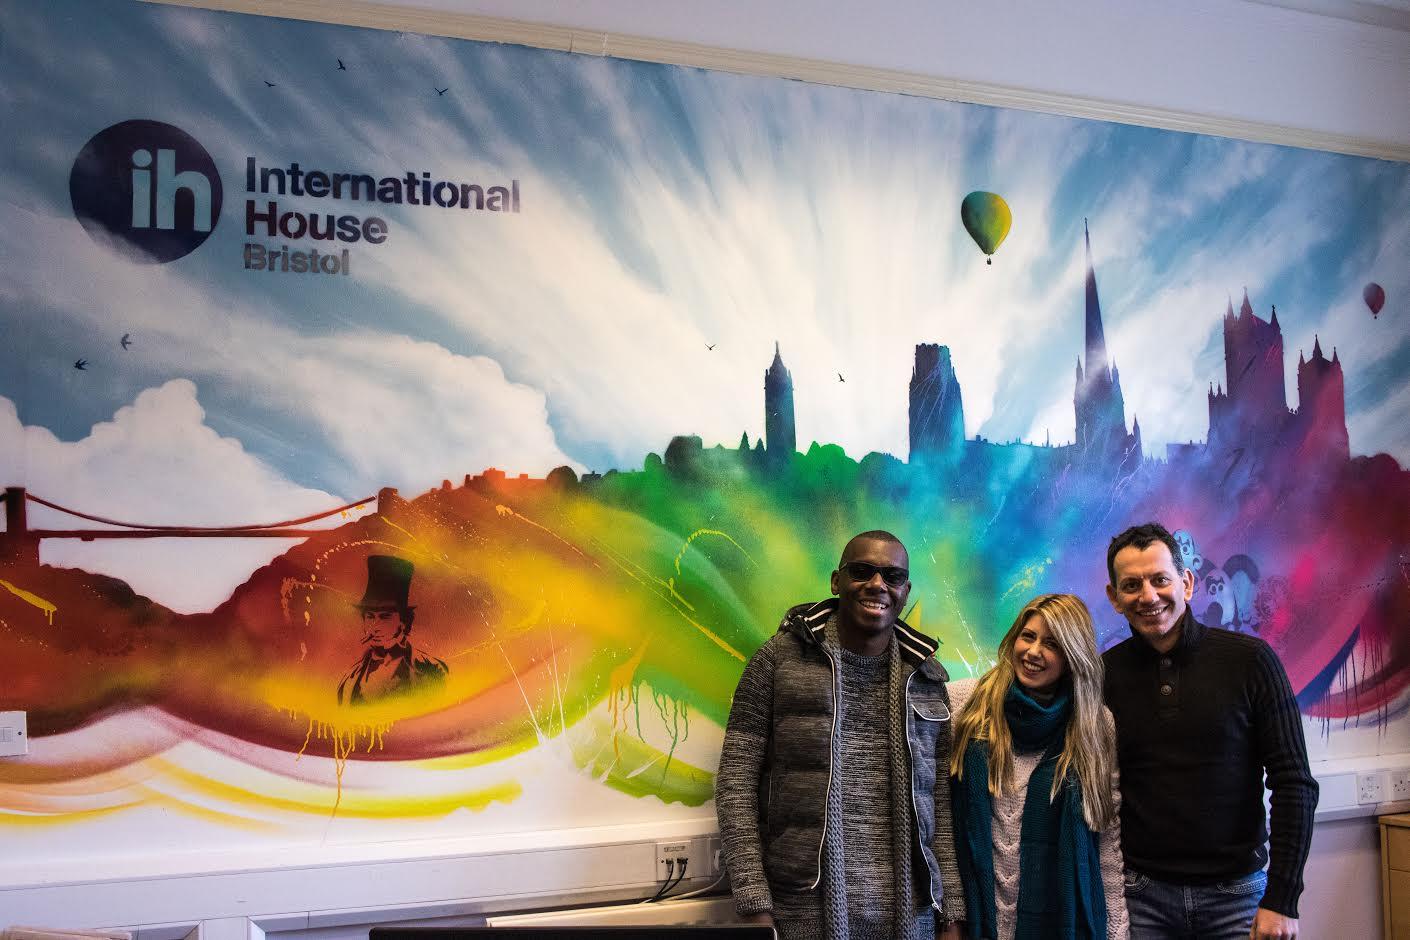 mural at International House Bristol